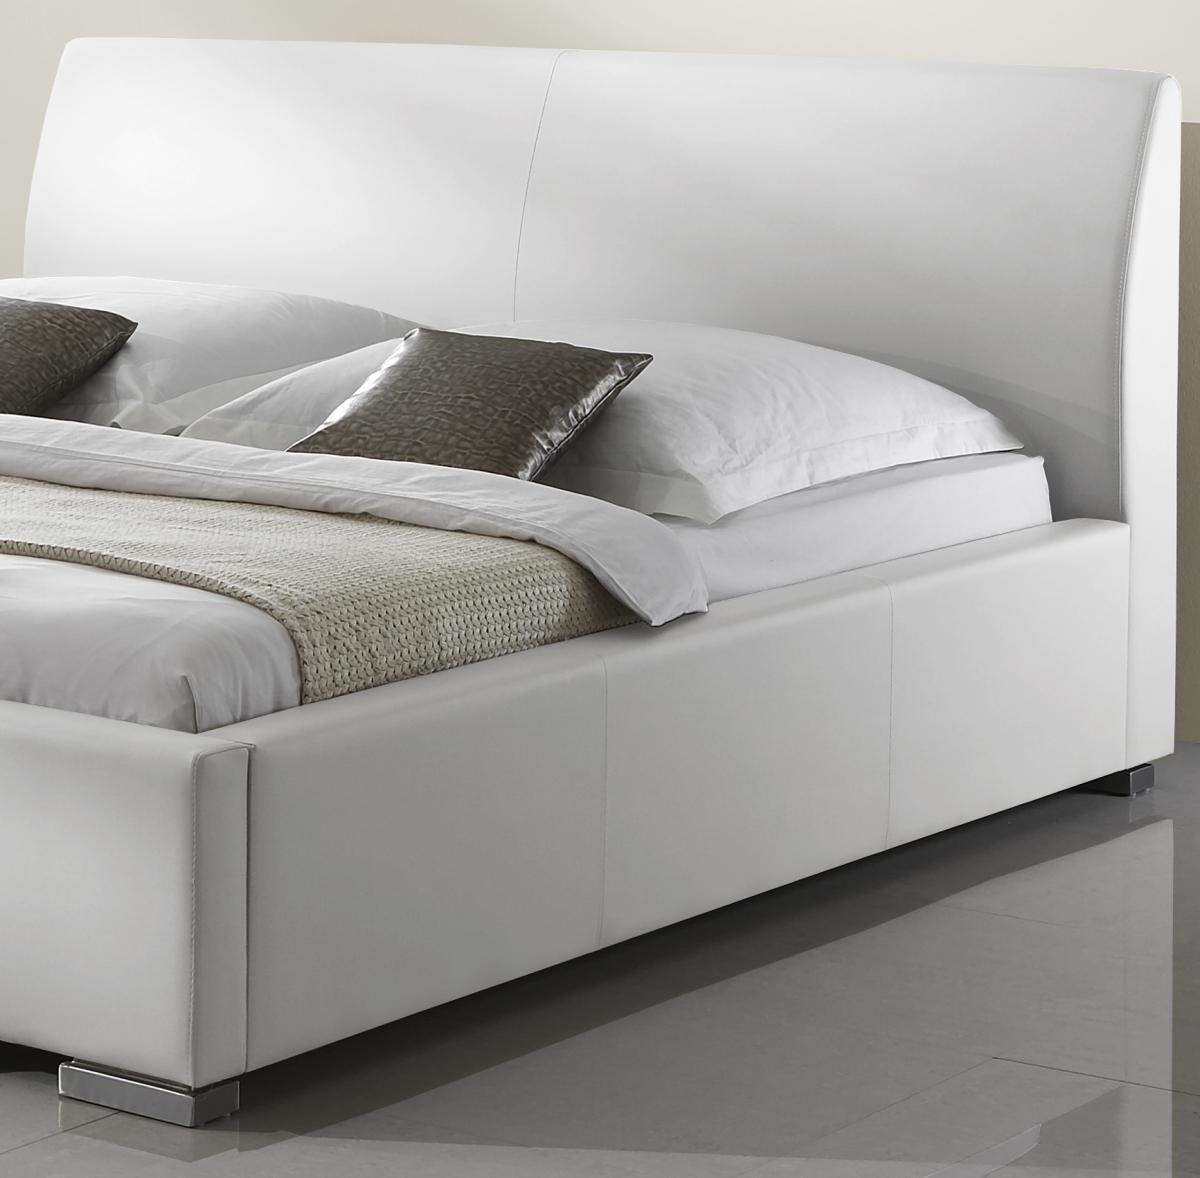 leder bett polsterbett amor lederbett weiss oder schwarz mit glattes kopfteil g nstig. Black Bedroom Furniture Sets. Home Design Ideas